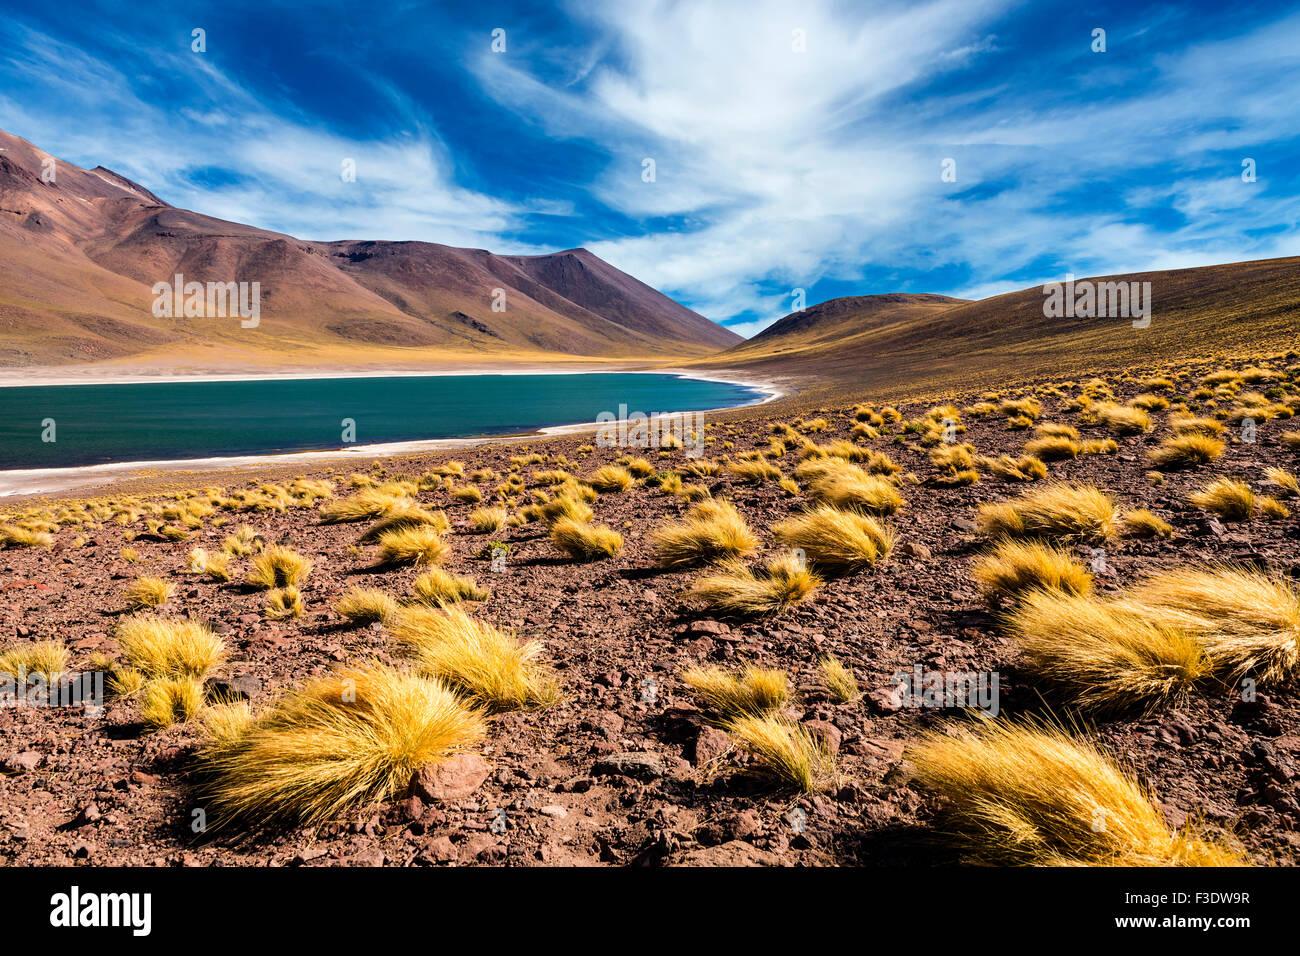 Der Meniquez-Lagune in der Atacama-Wüste, Chile, 2013 Stockbild